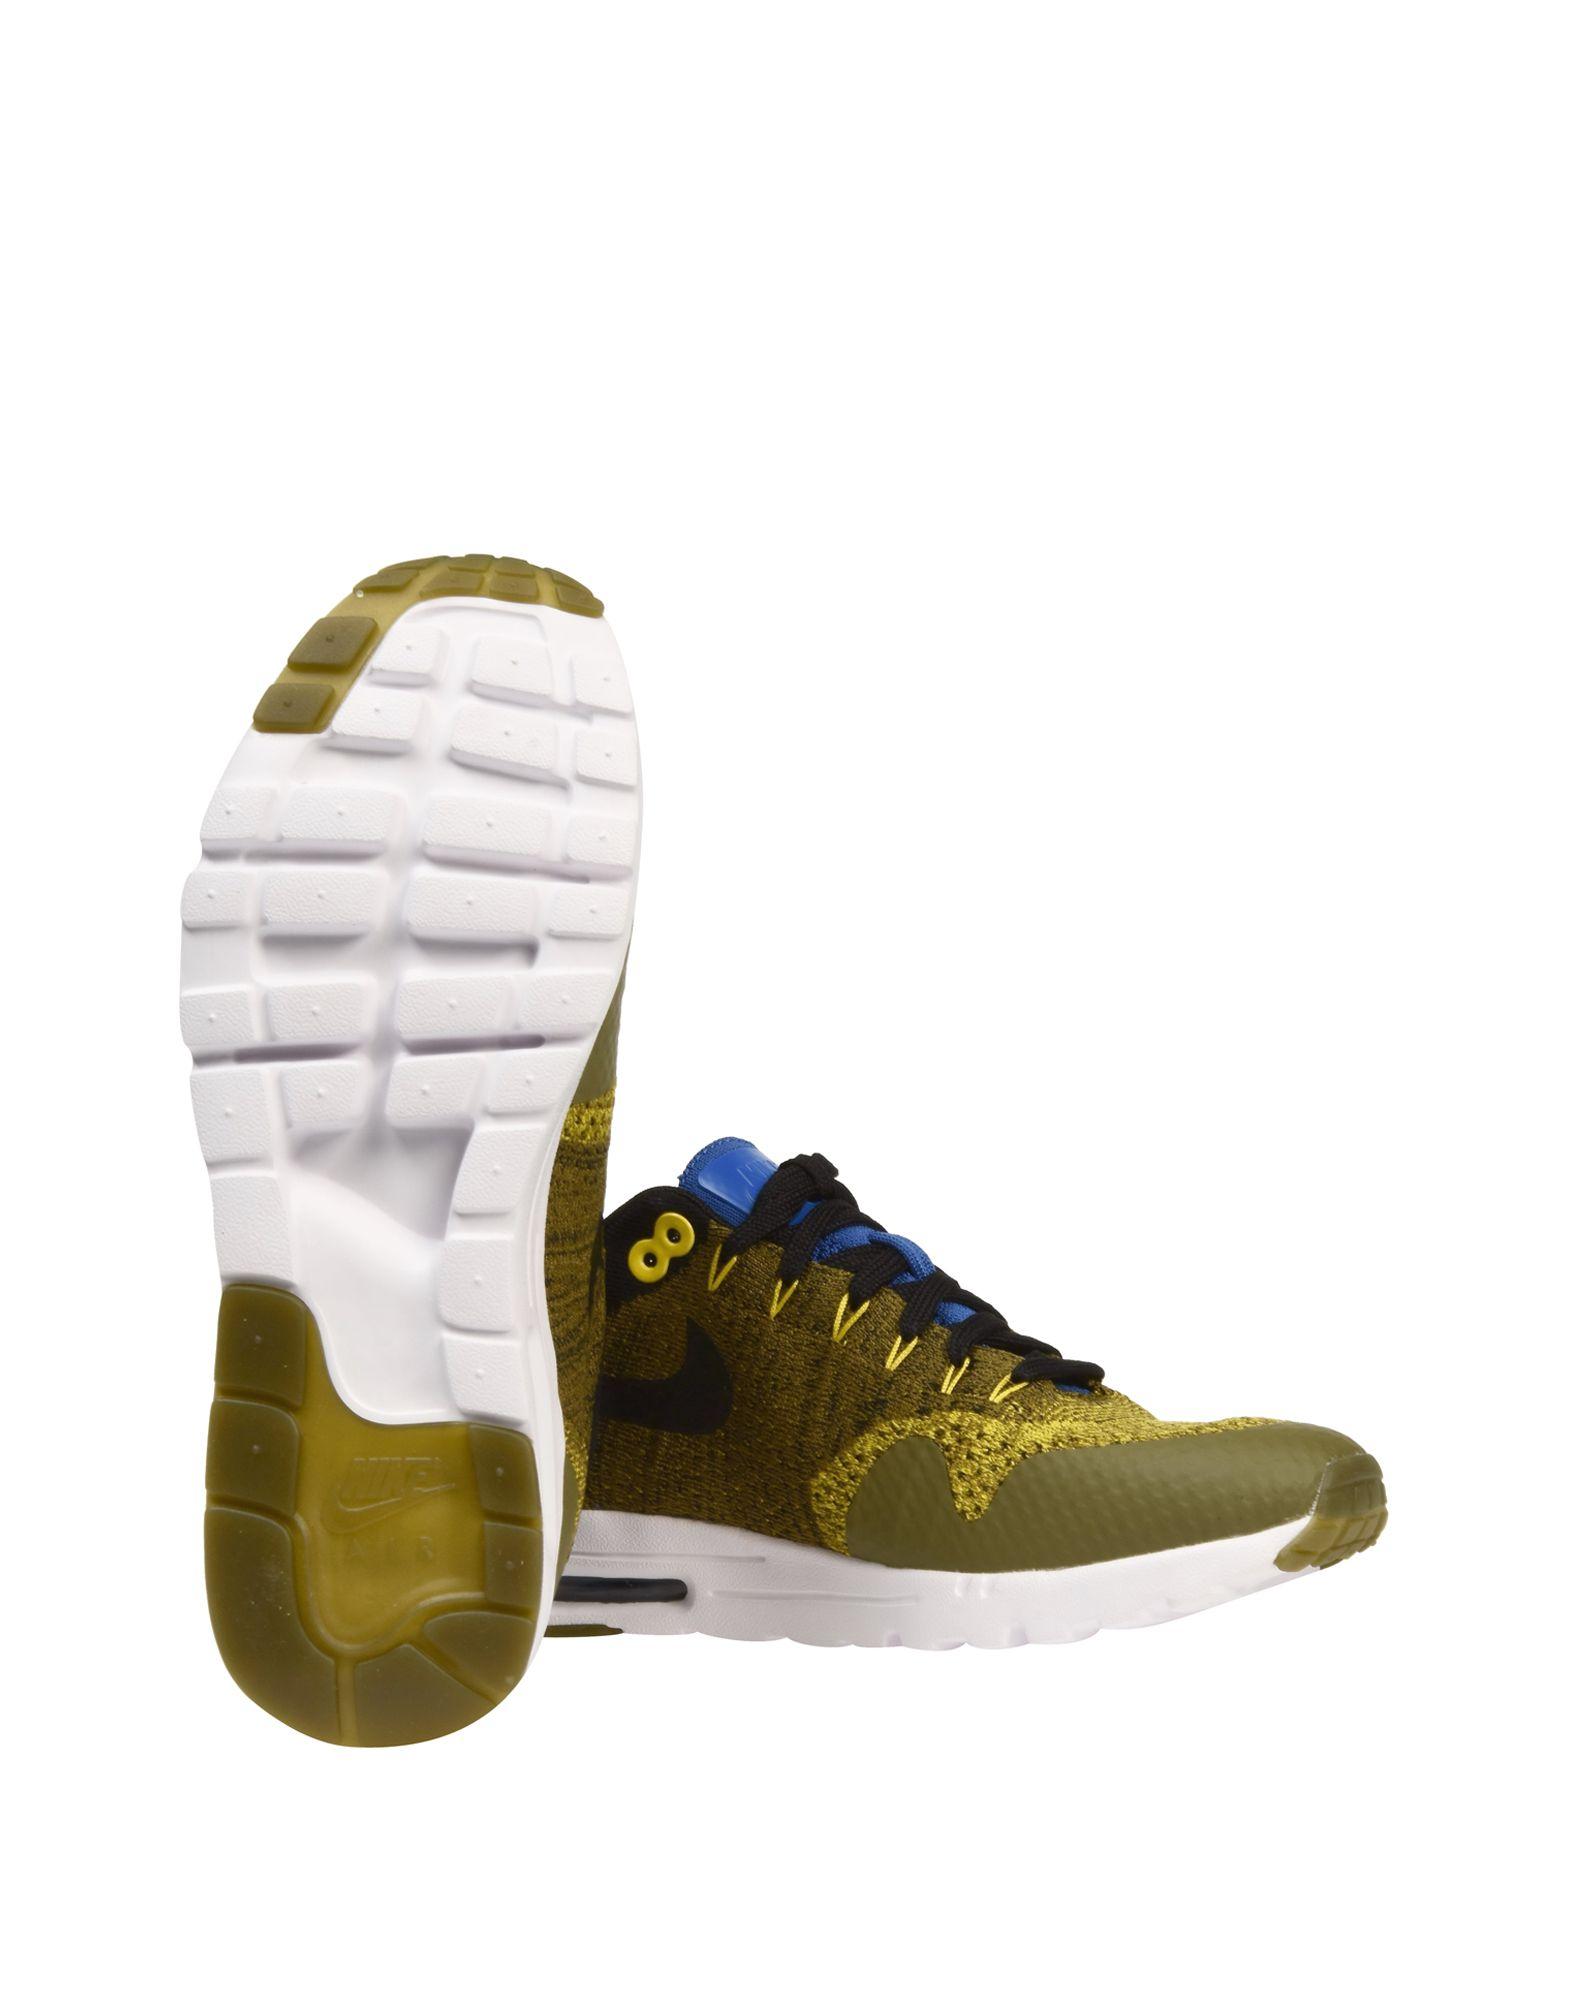 Sneakers Nike Air Max 1 Ultra Flyknit - Femme - Sneakers Nike sur ...